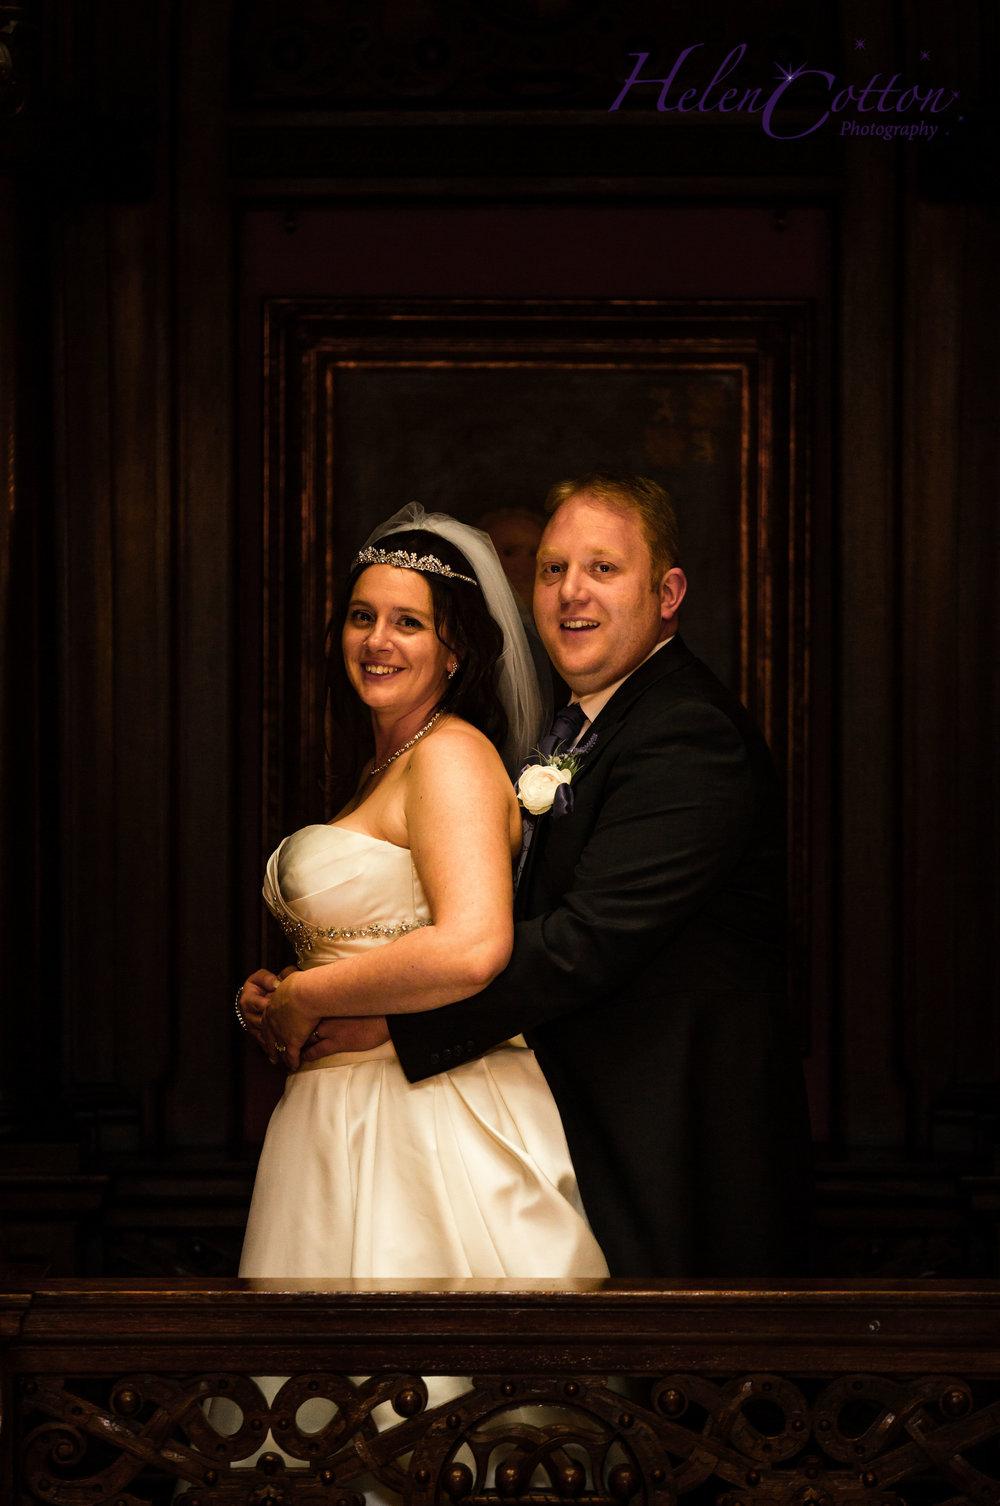 Vicky & Chris_web_Helen Cotton Photography©IMG_2544.JPG